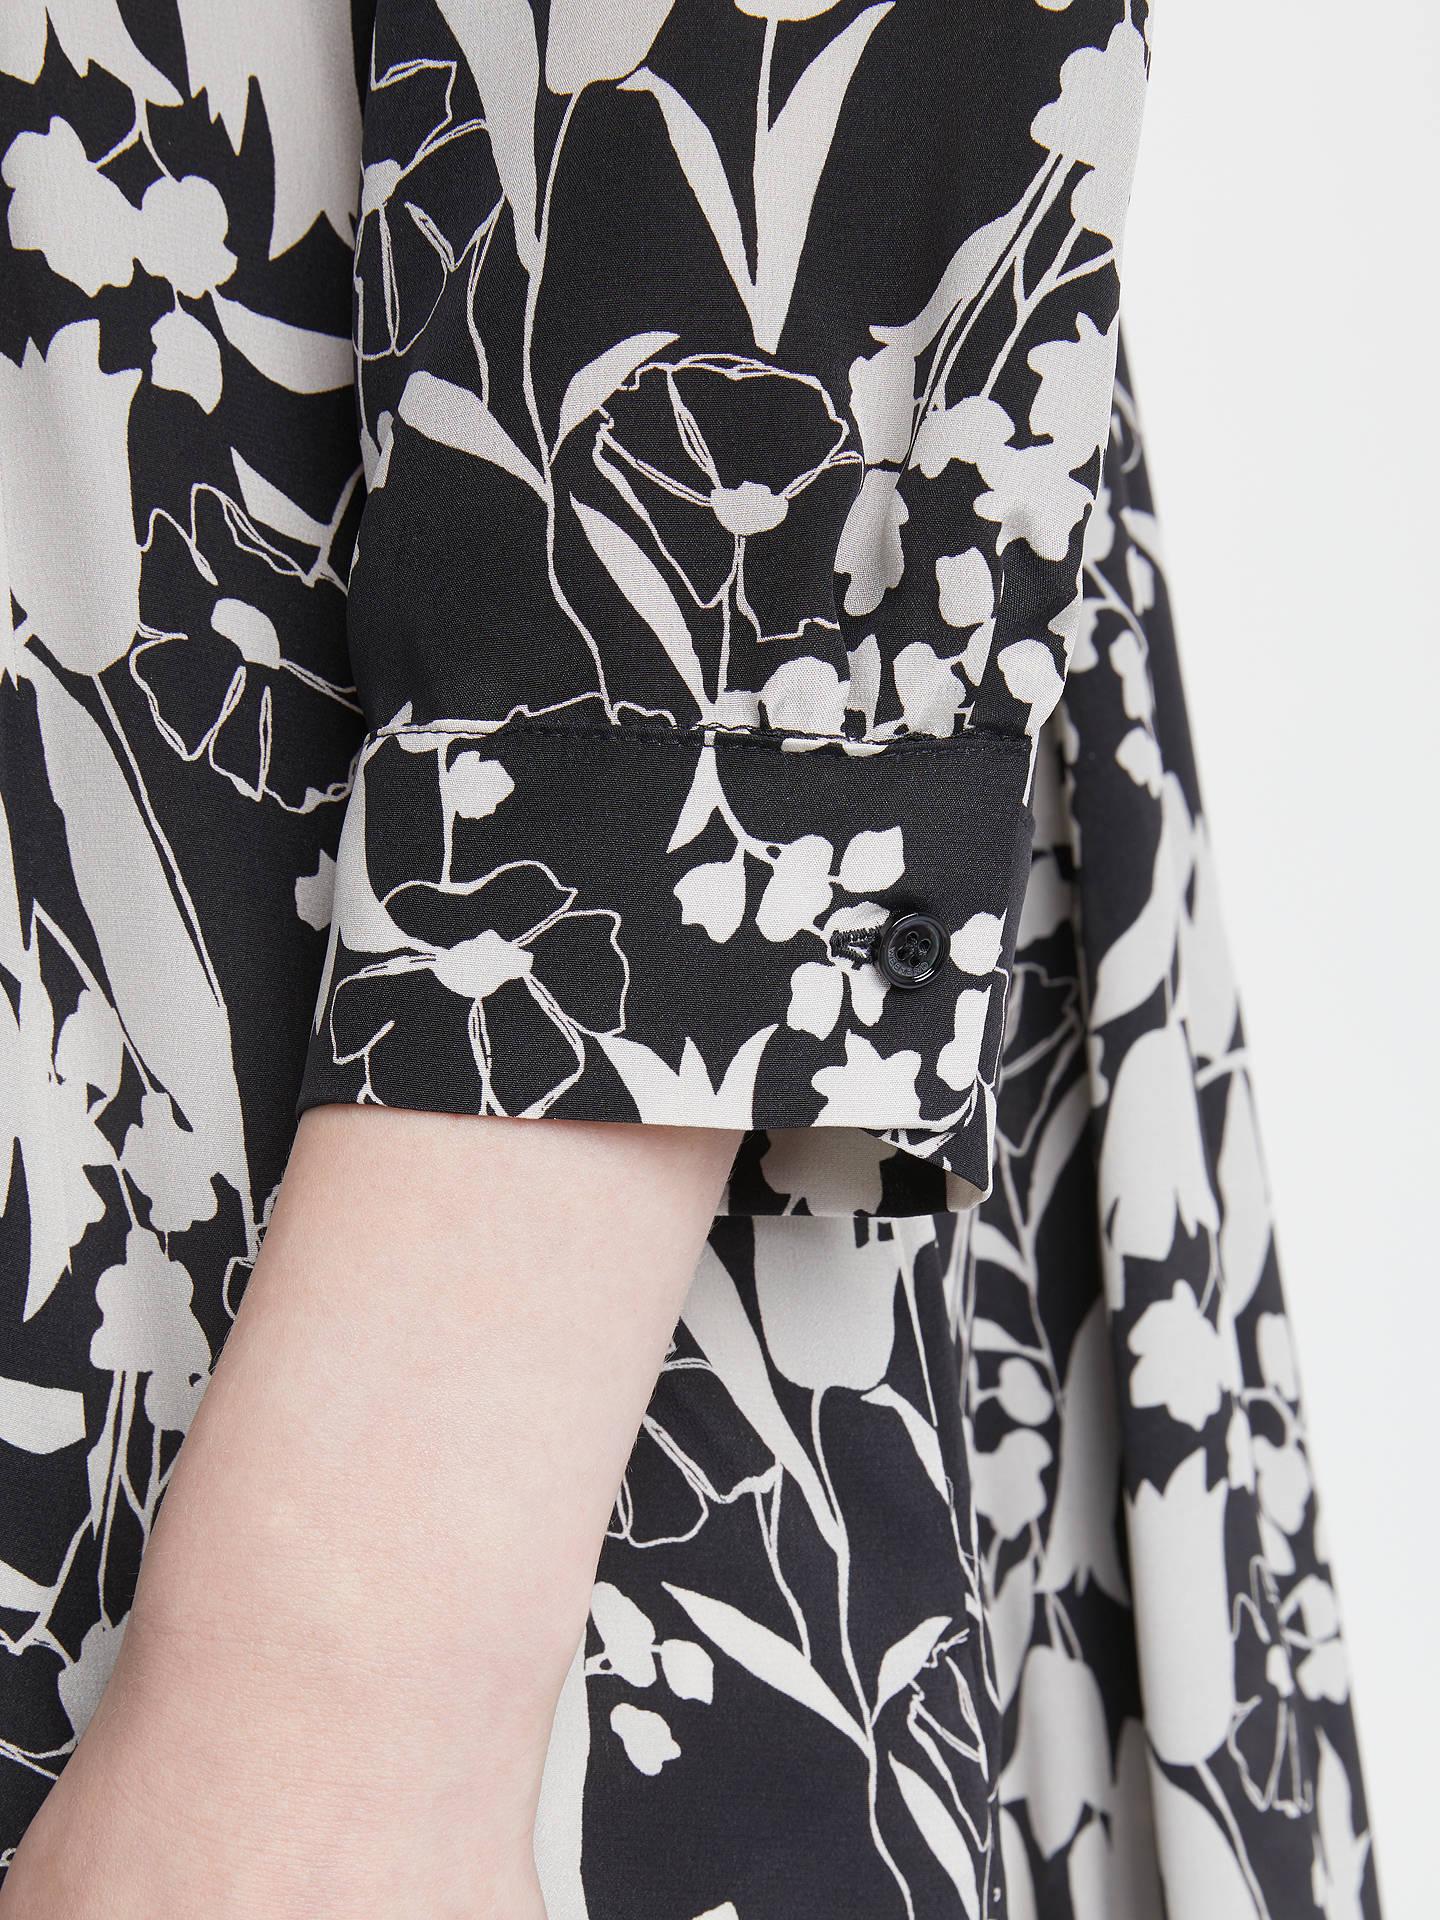 a73b293a7c9 ... Buy Weekend MaxMara Mattino Floral Print Silk Dress